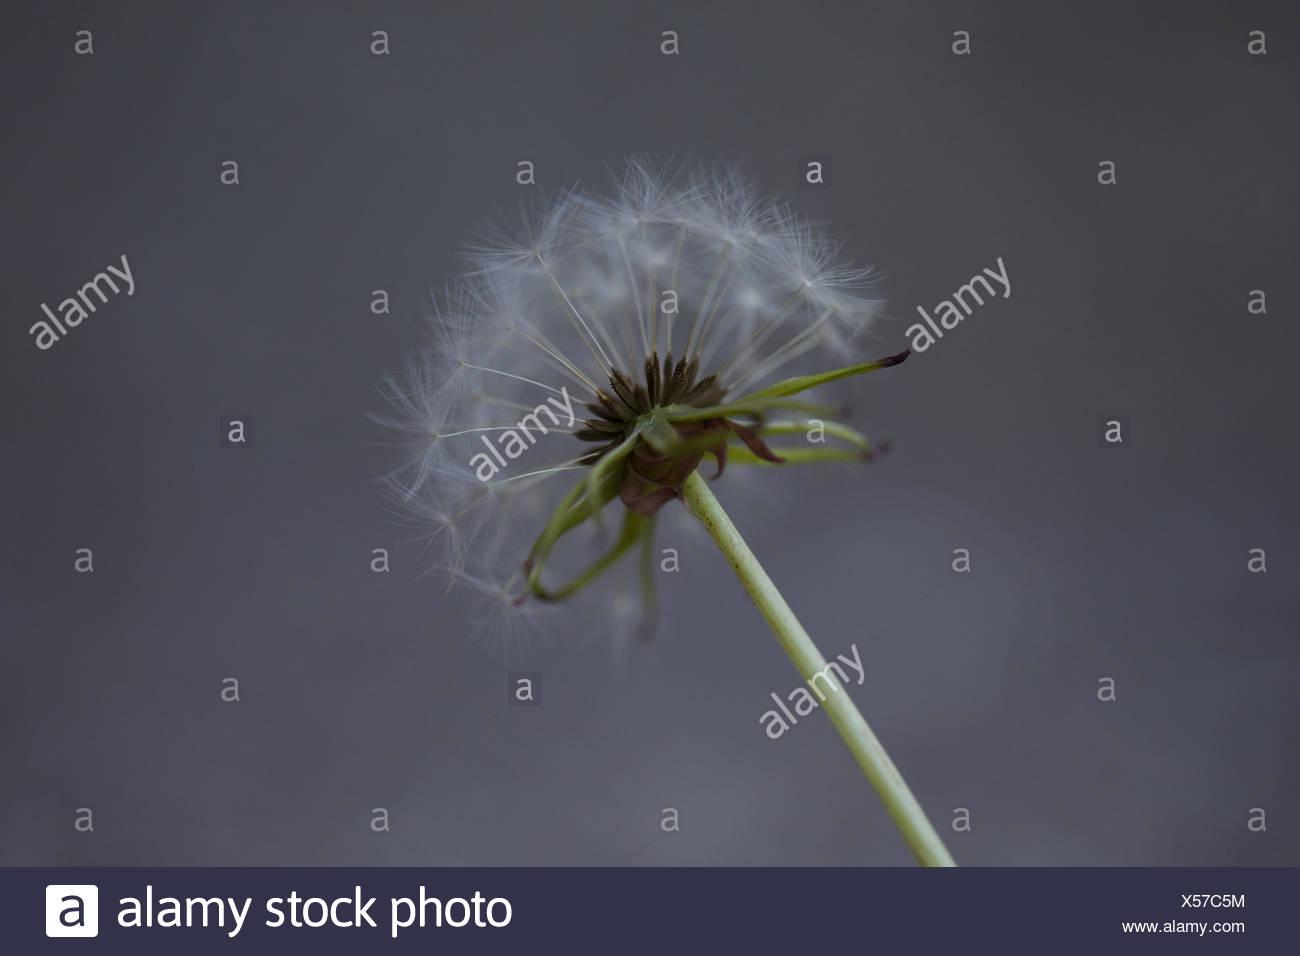 stem of dandelion flower. pattern, growth, fragile, seed. - Stock Image